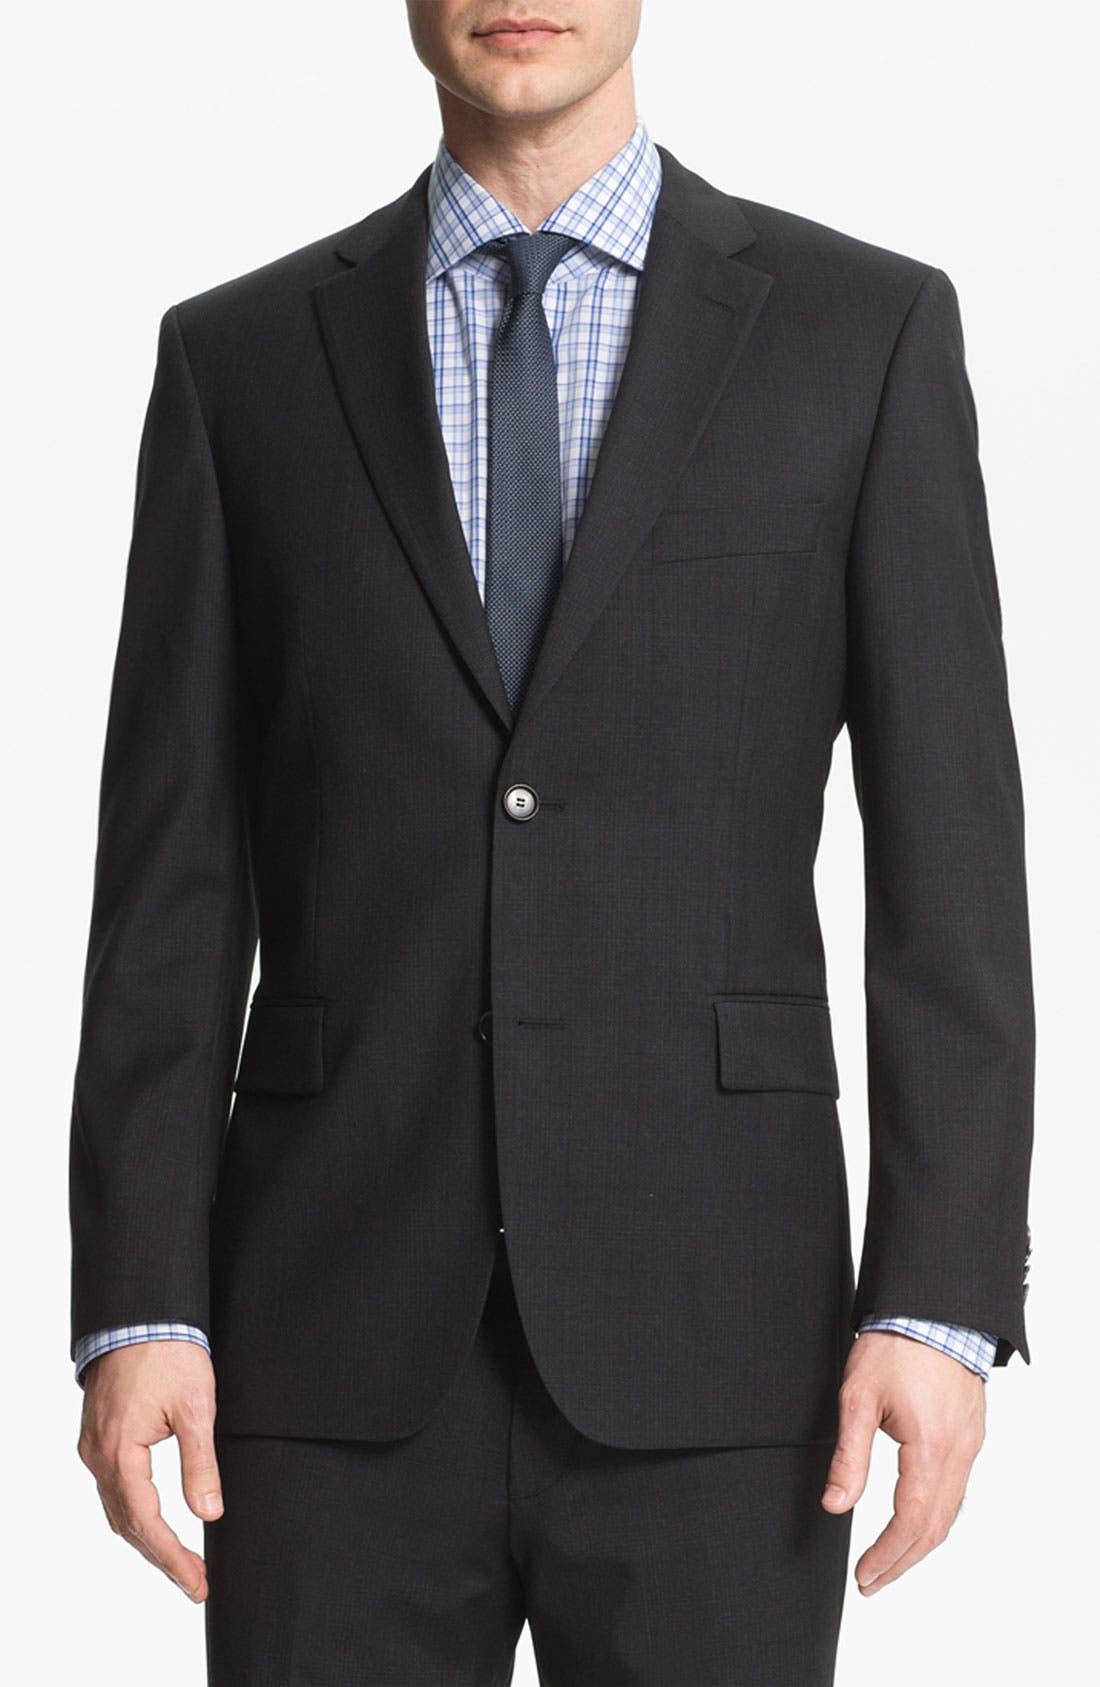 Main Image - BOSS Black 'Pasini/Movie' Plaid Wool Suit